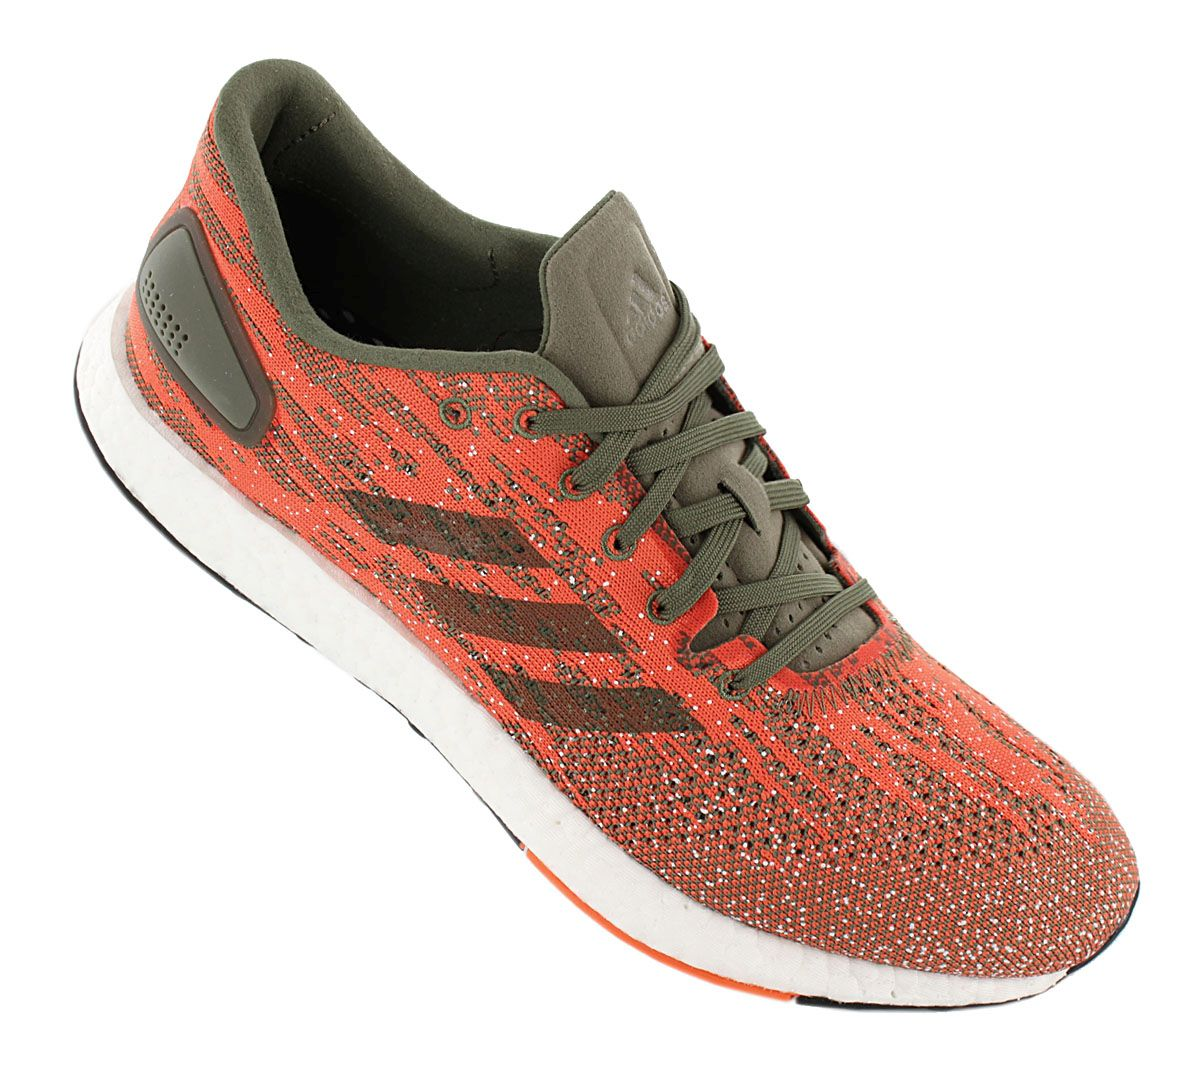 adidas Pure Boost DPR Herren Laufschuh F36635 Sportschuh Fitness Trainings Schuh